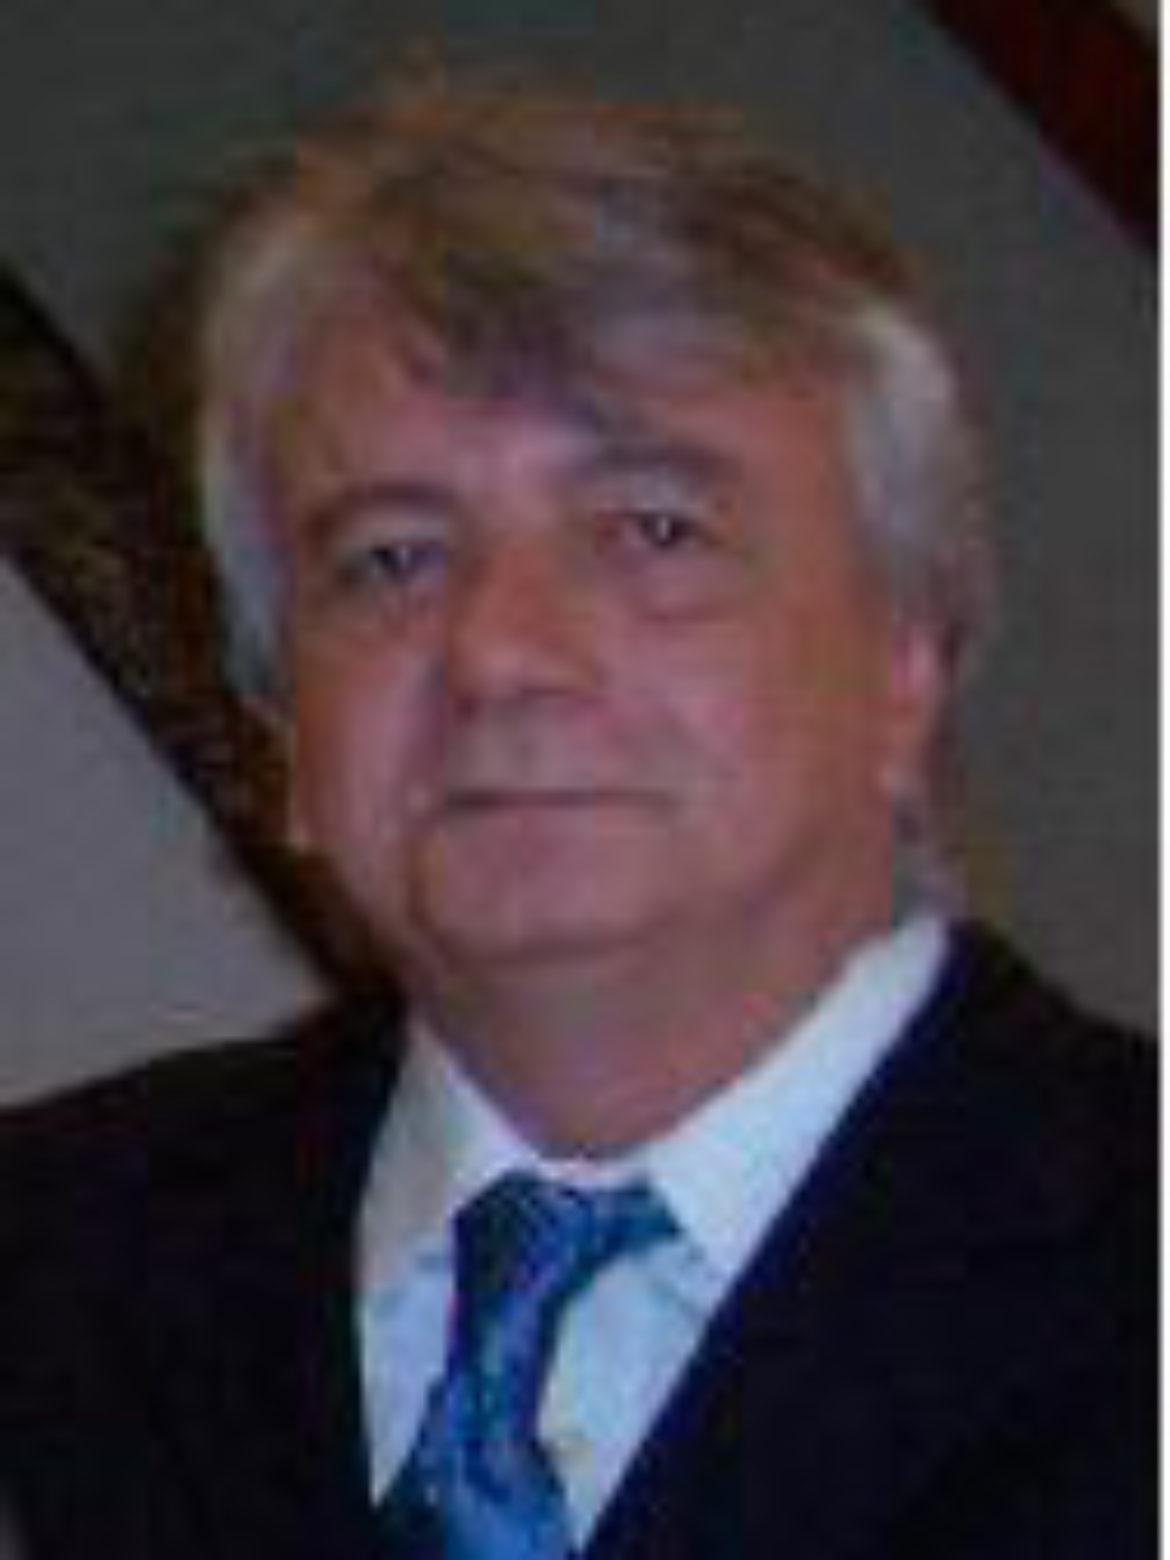 João Telles Júnior